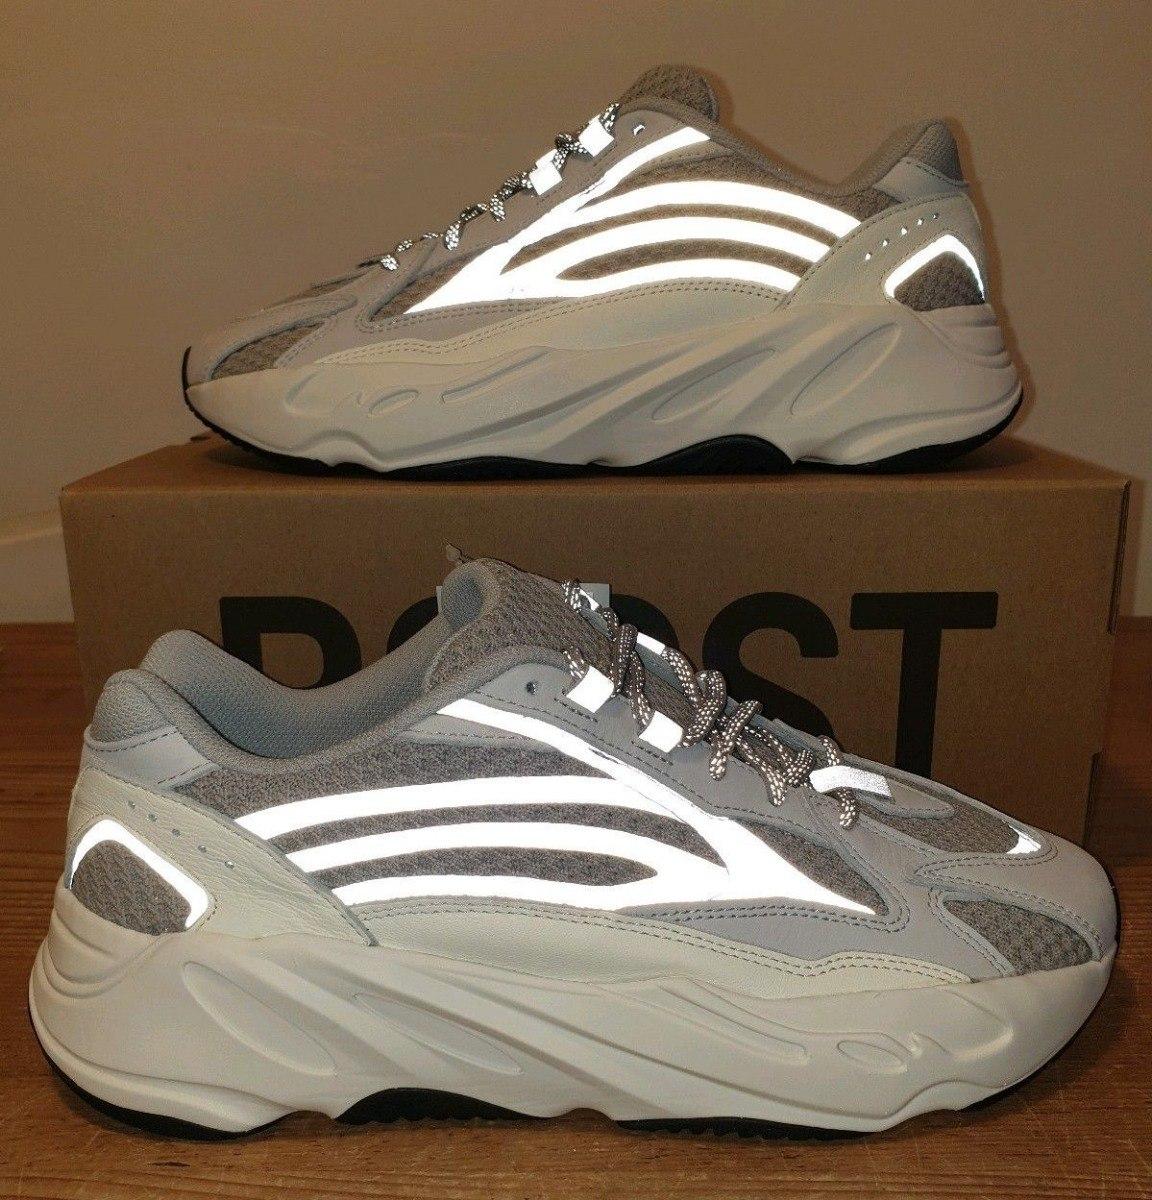 891938347 Zapatillas adidas Yeezy 700 V2 Static Wave Runner - S  400